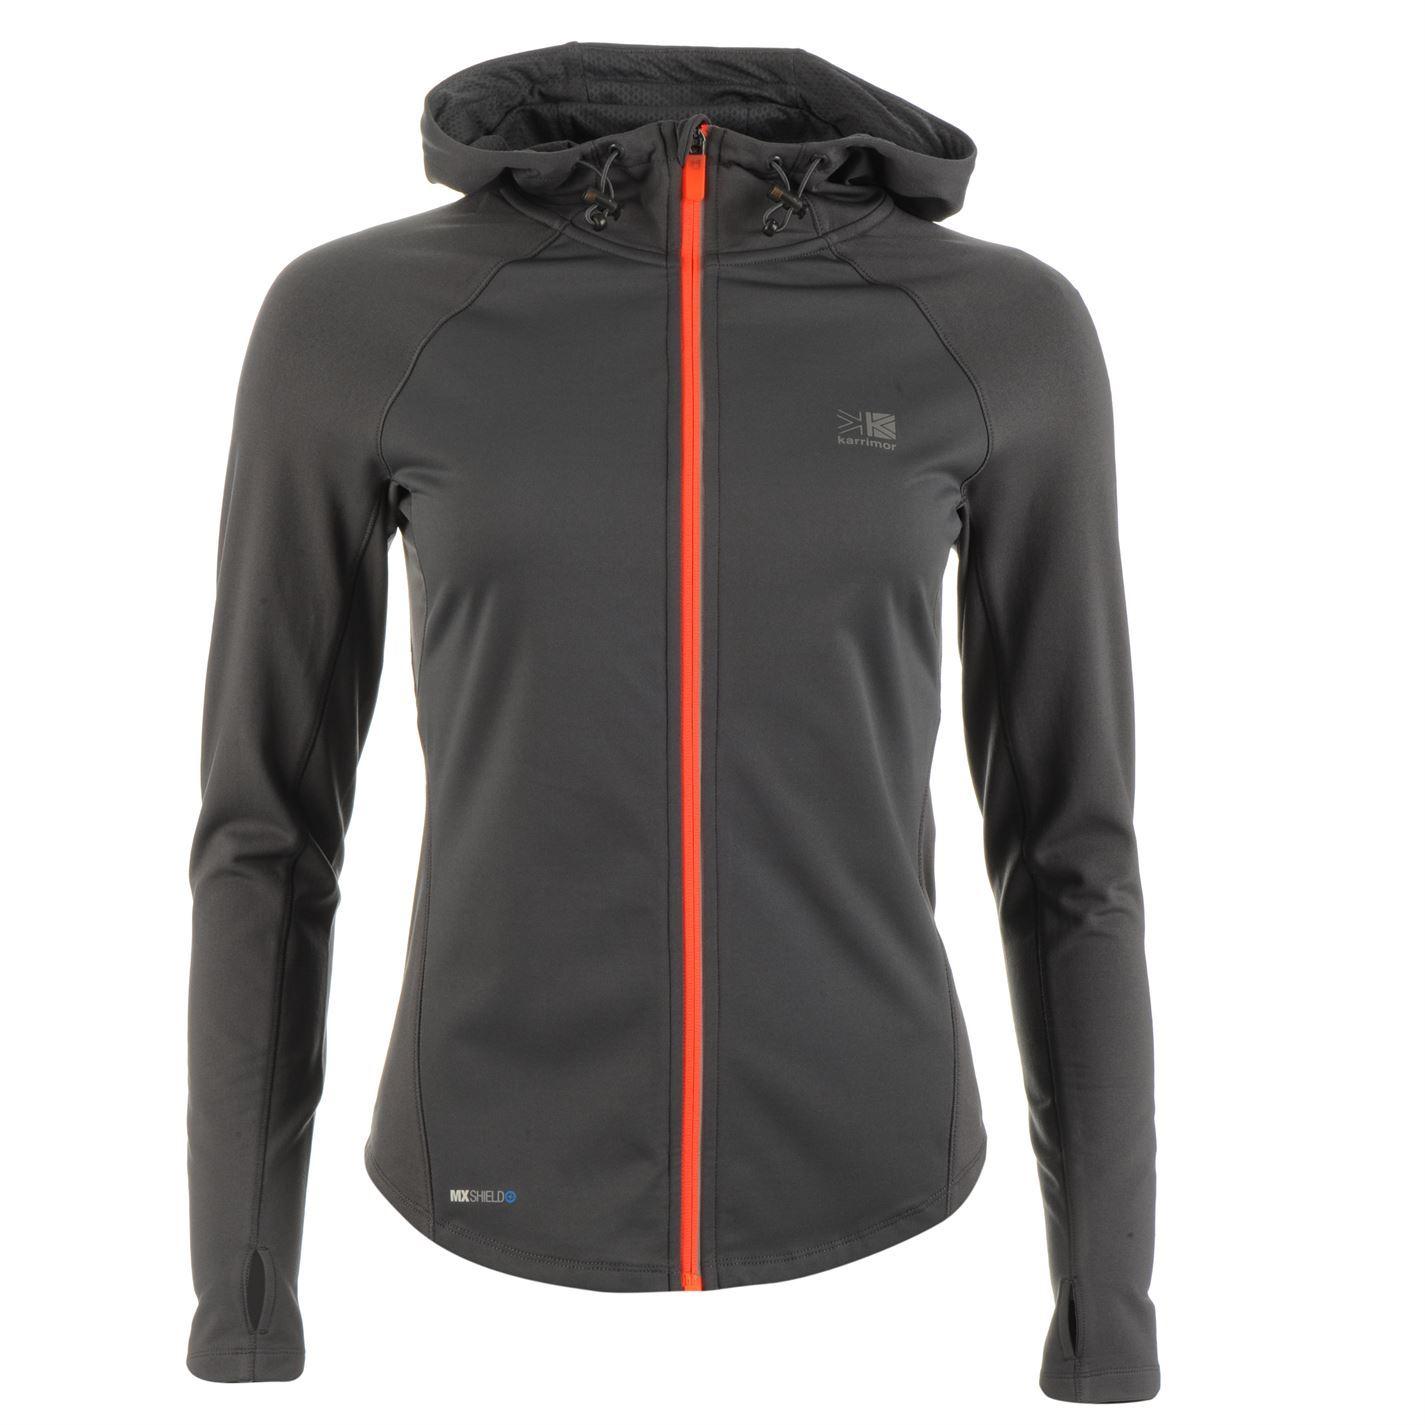 Karrimor-XLite-MXShield-Running-Jacket-Ladies-Performance-Coat-Top-Full-Length